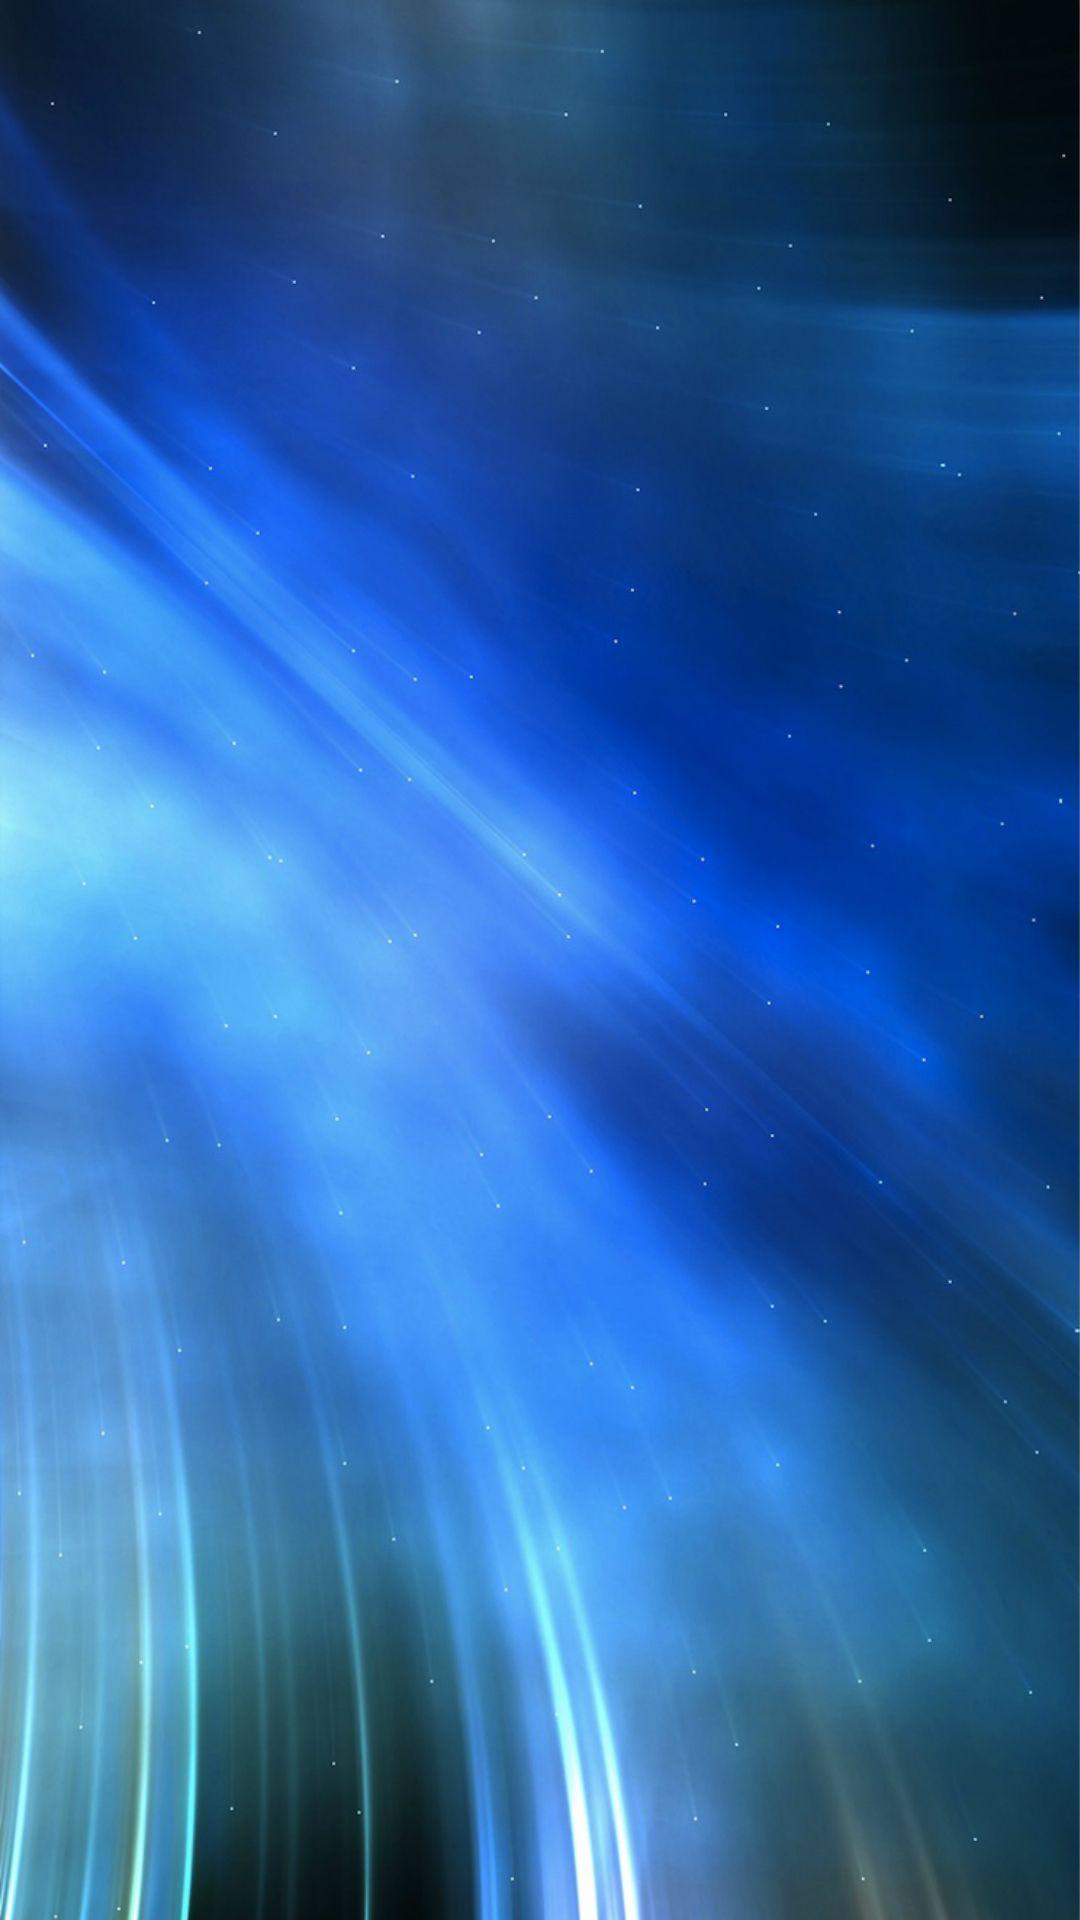 Abstract Blue Smoke Light Swirl Background iPhone 6